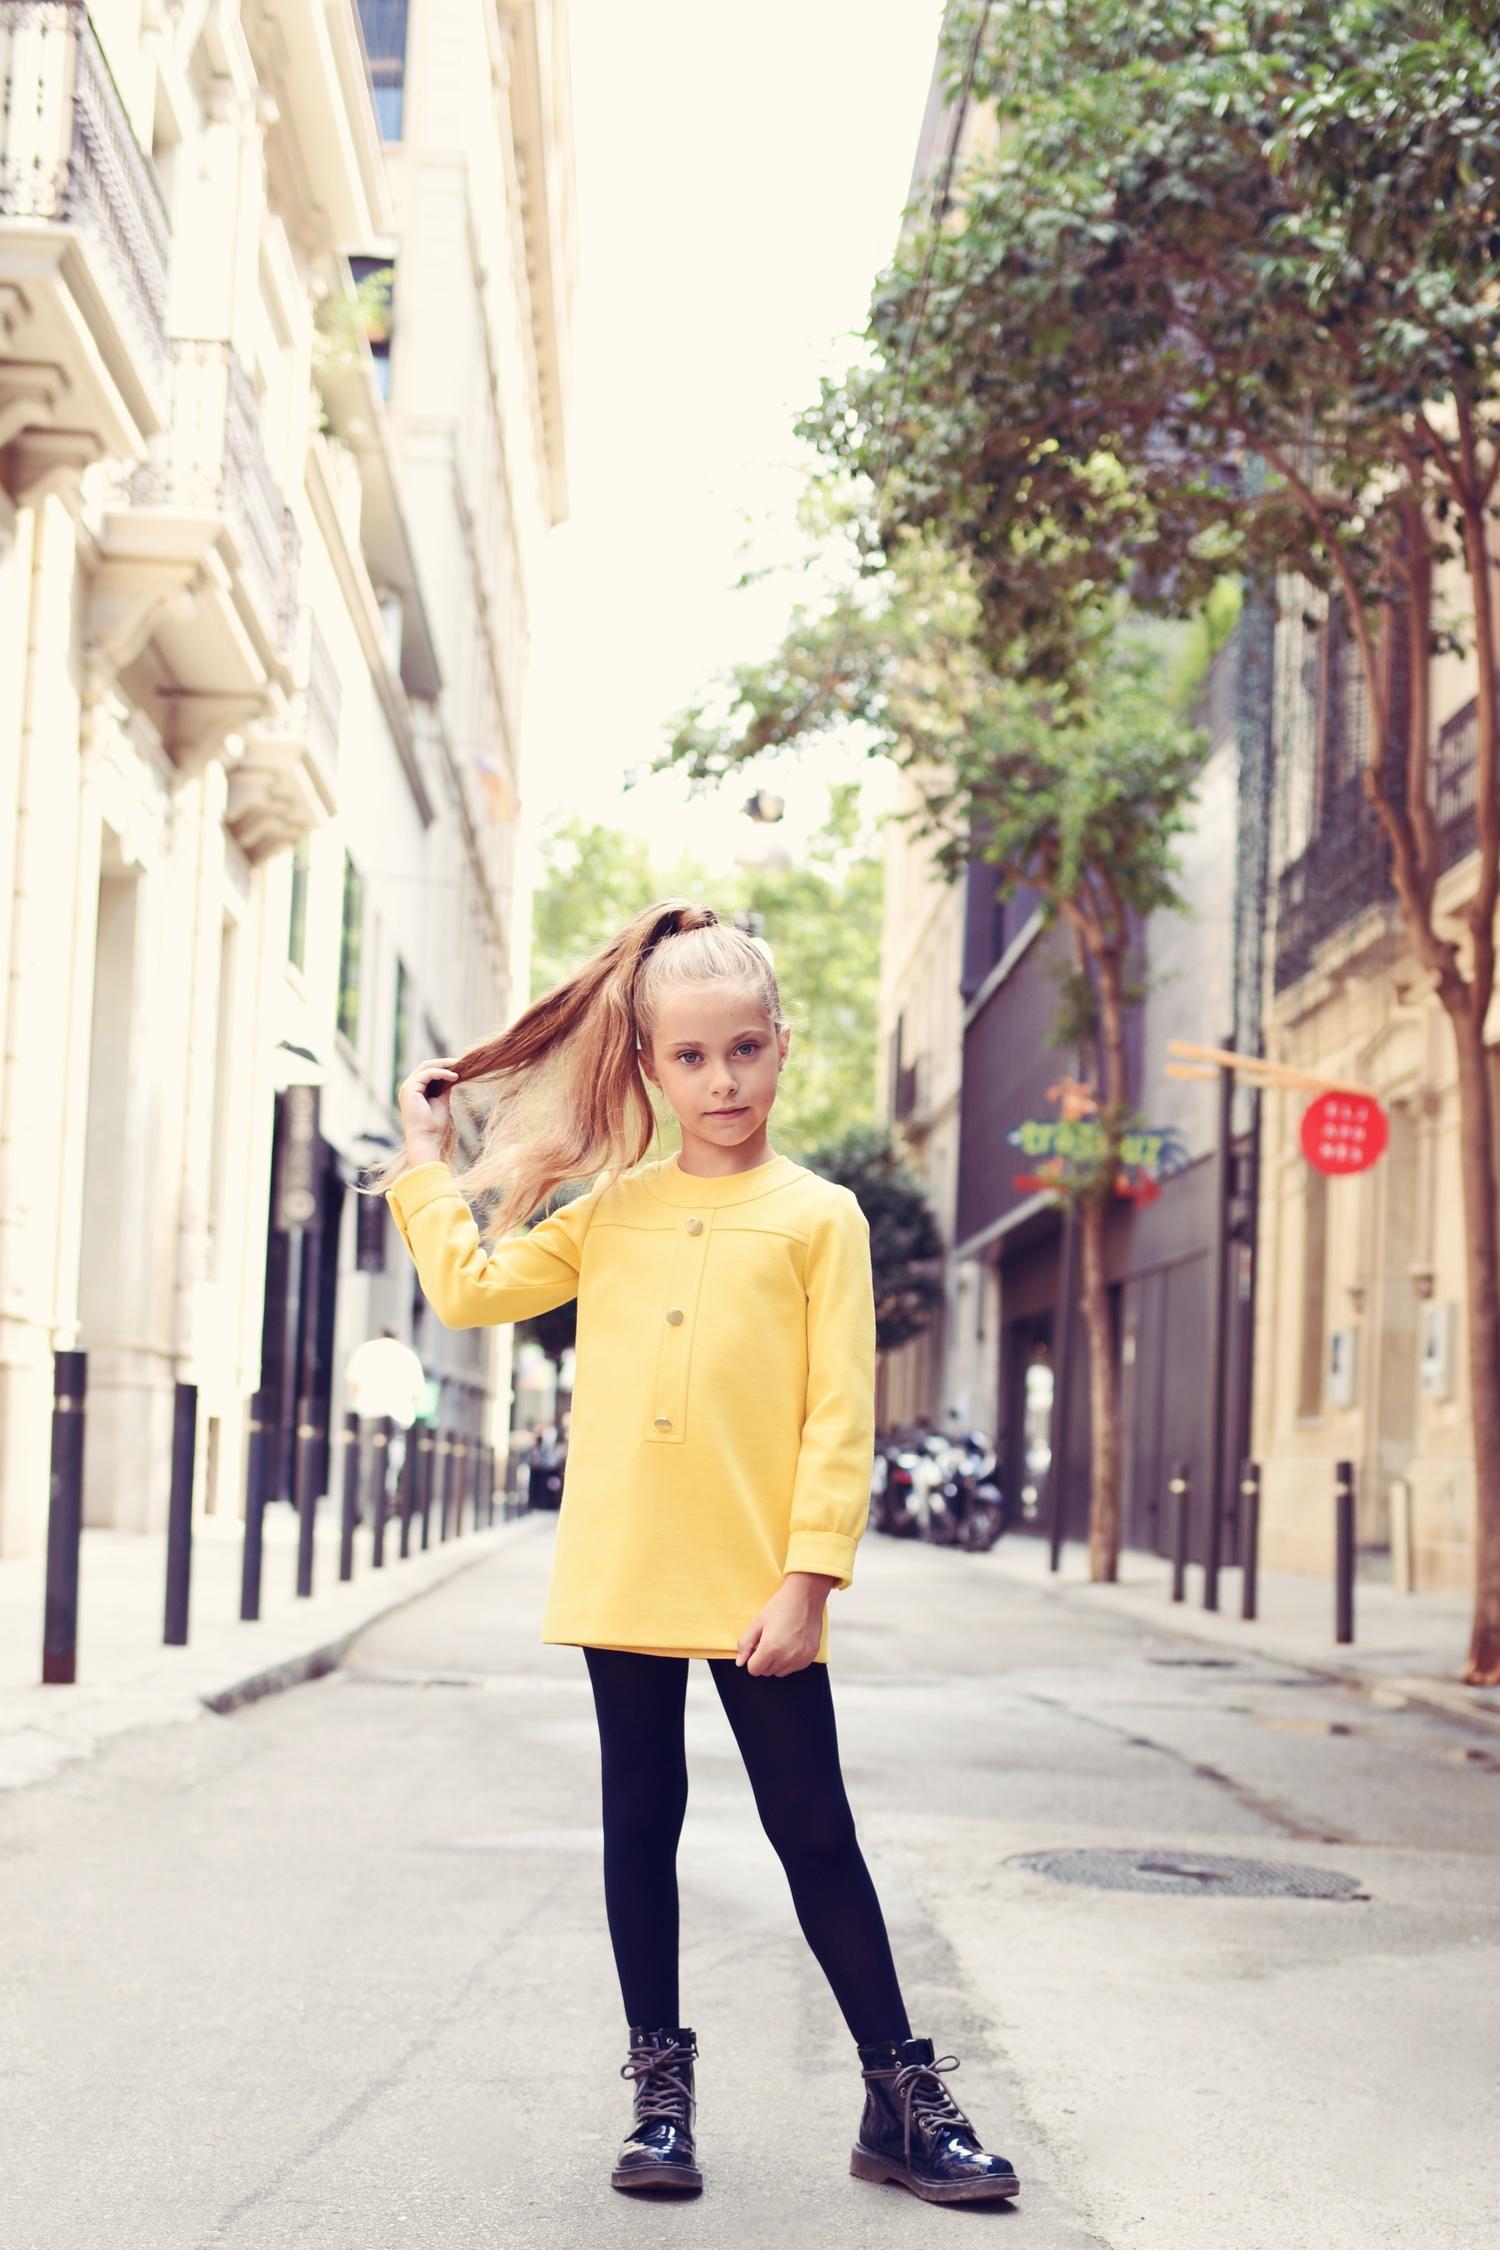 Enfant+Street+Style+by+Gina+Kim+Photography-7.jpeg